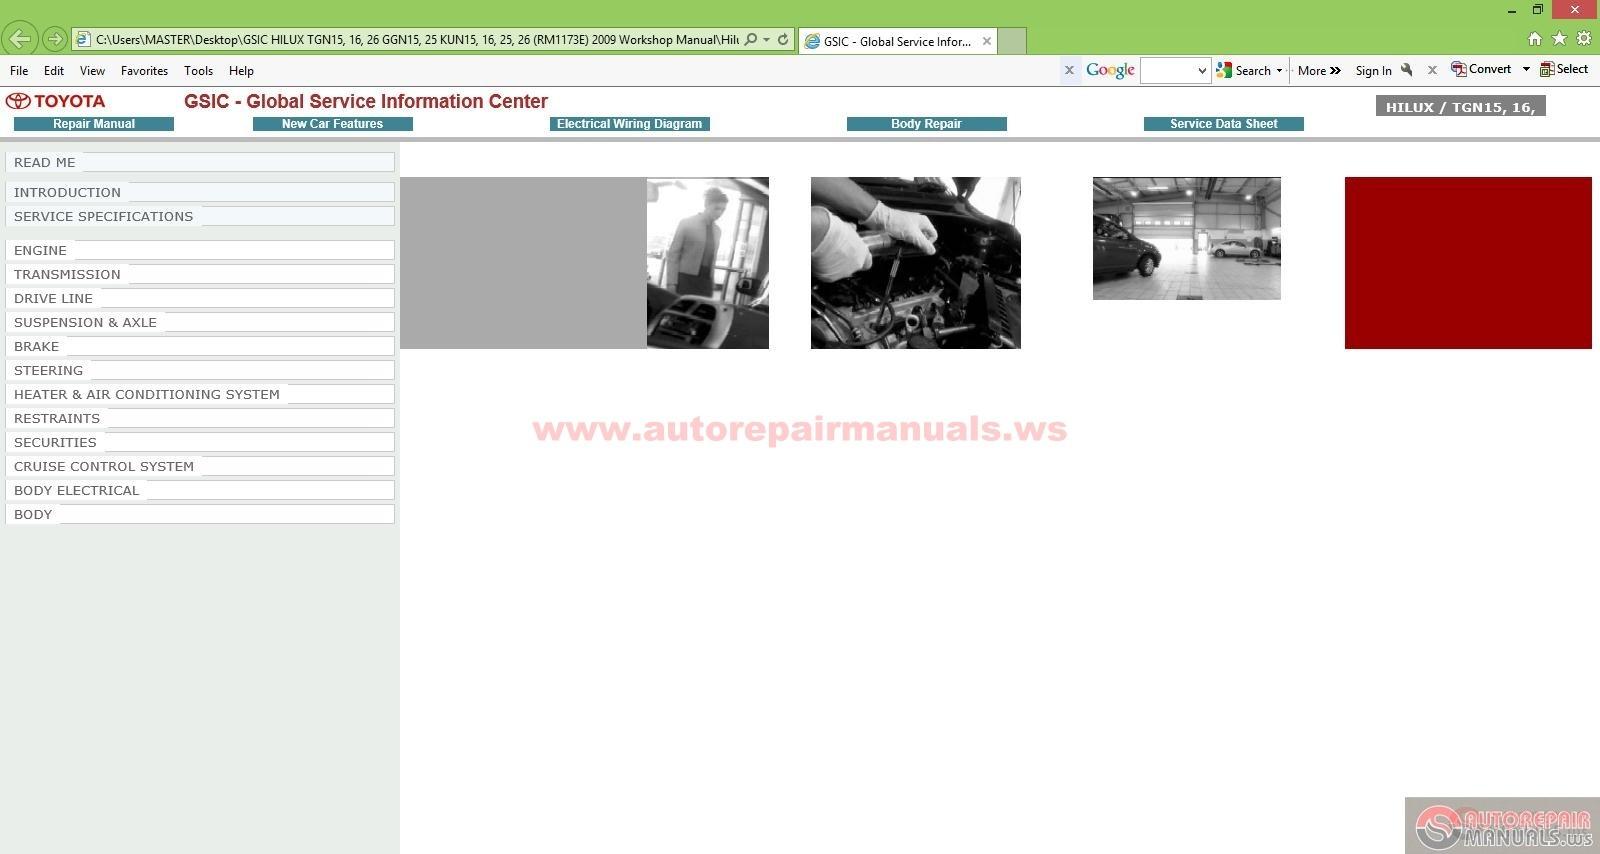 Gsic Hilux Tgn15  16  26 Ggn15  25 Kun15  16  25  26  Rm1173e  2009 Workshop Manual